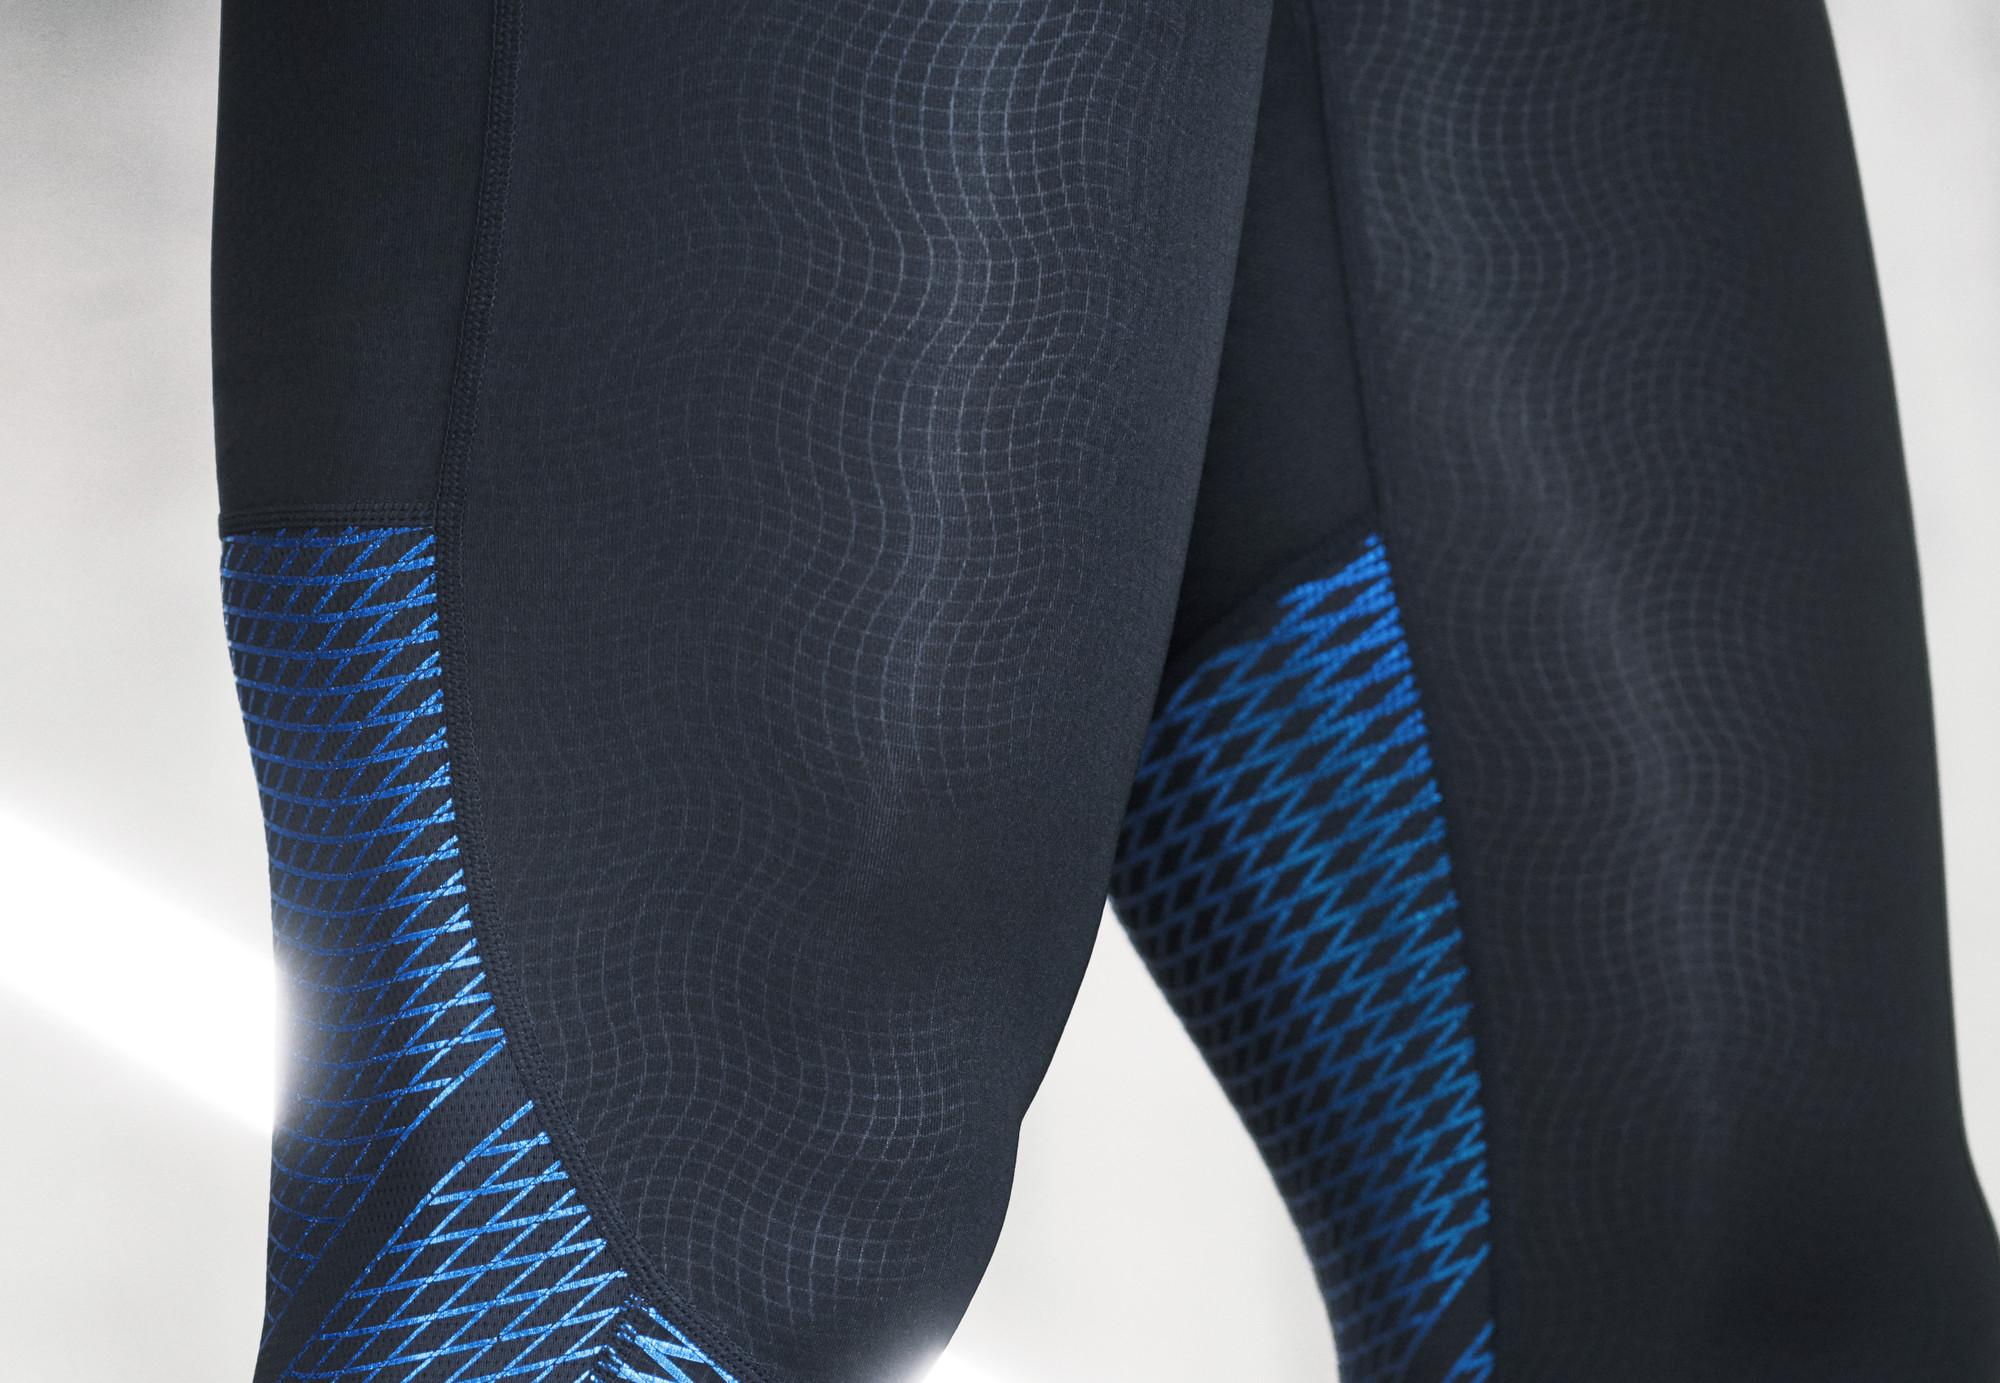 SP16_BSTY_Tights_NikePro_HypercoolMax_Detail2_02_original